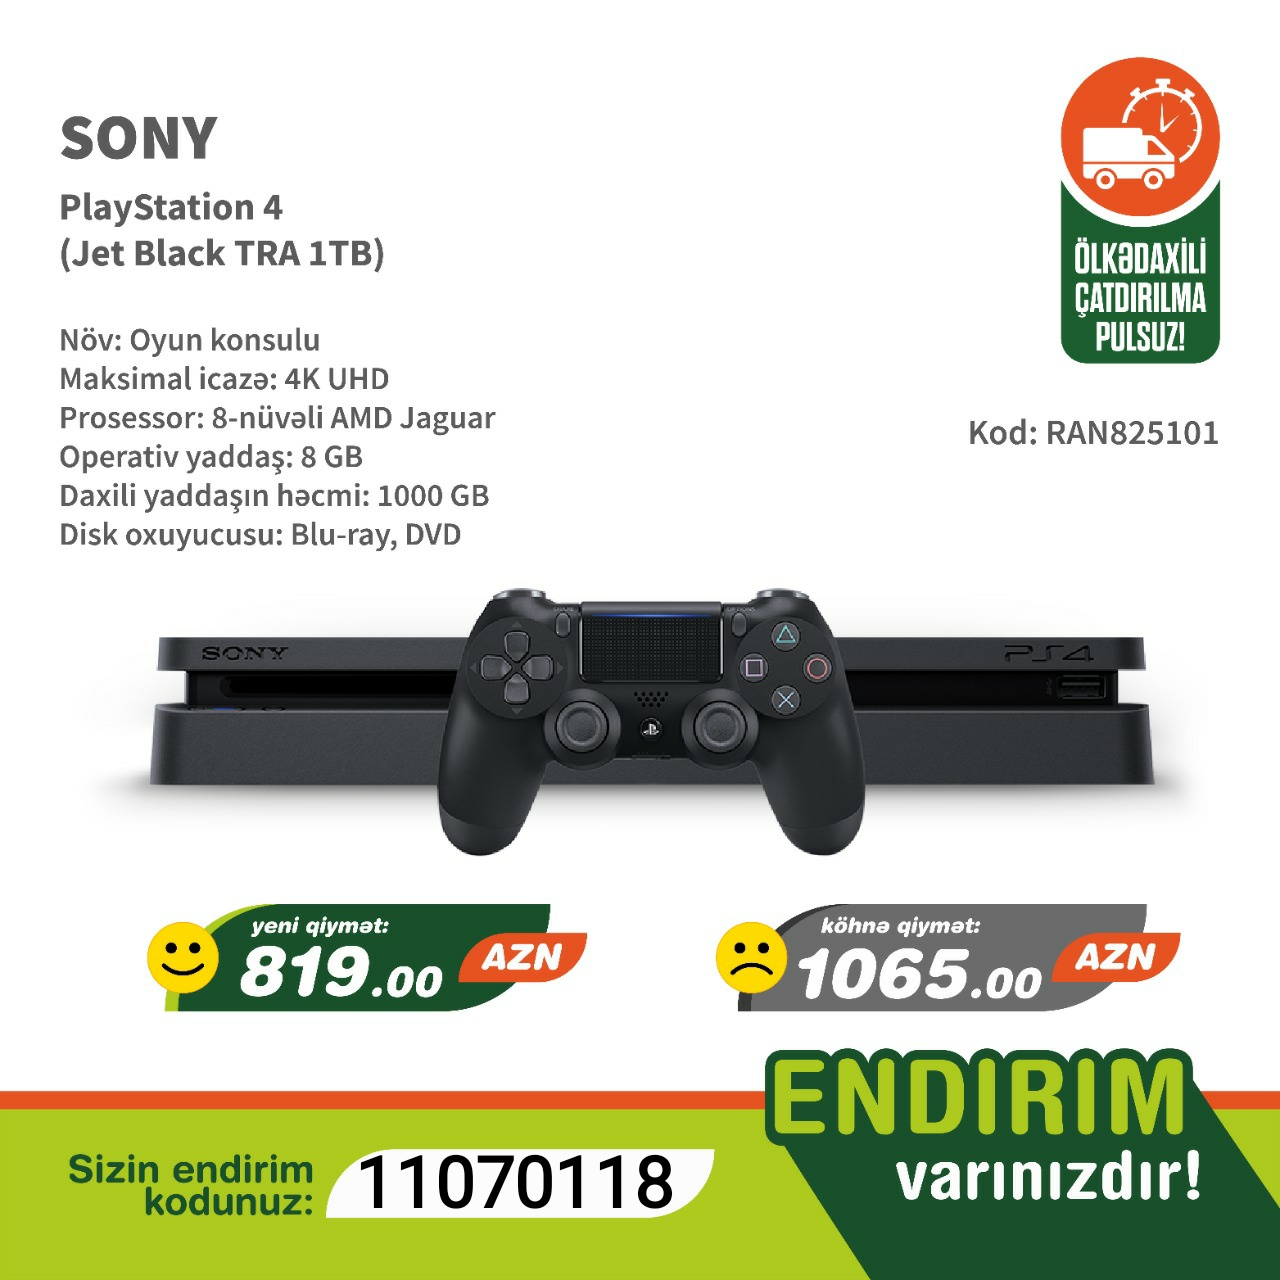 Sony PlayStation 4 (Jet Black TRA 1TB) Prosessor: 8 Nüvəli